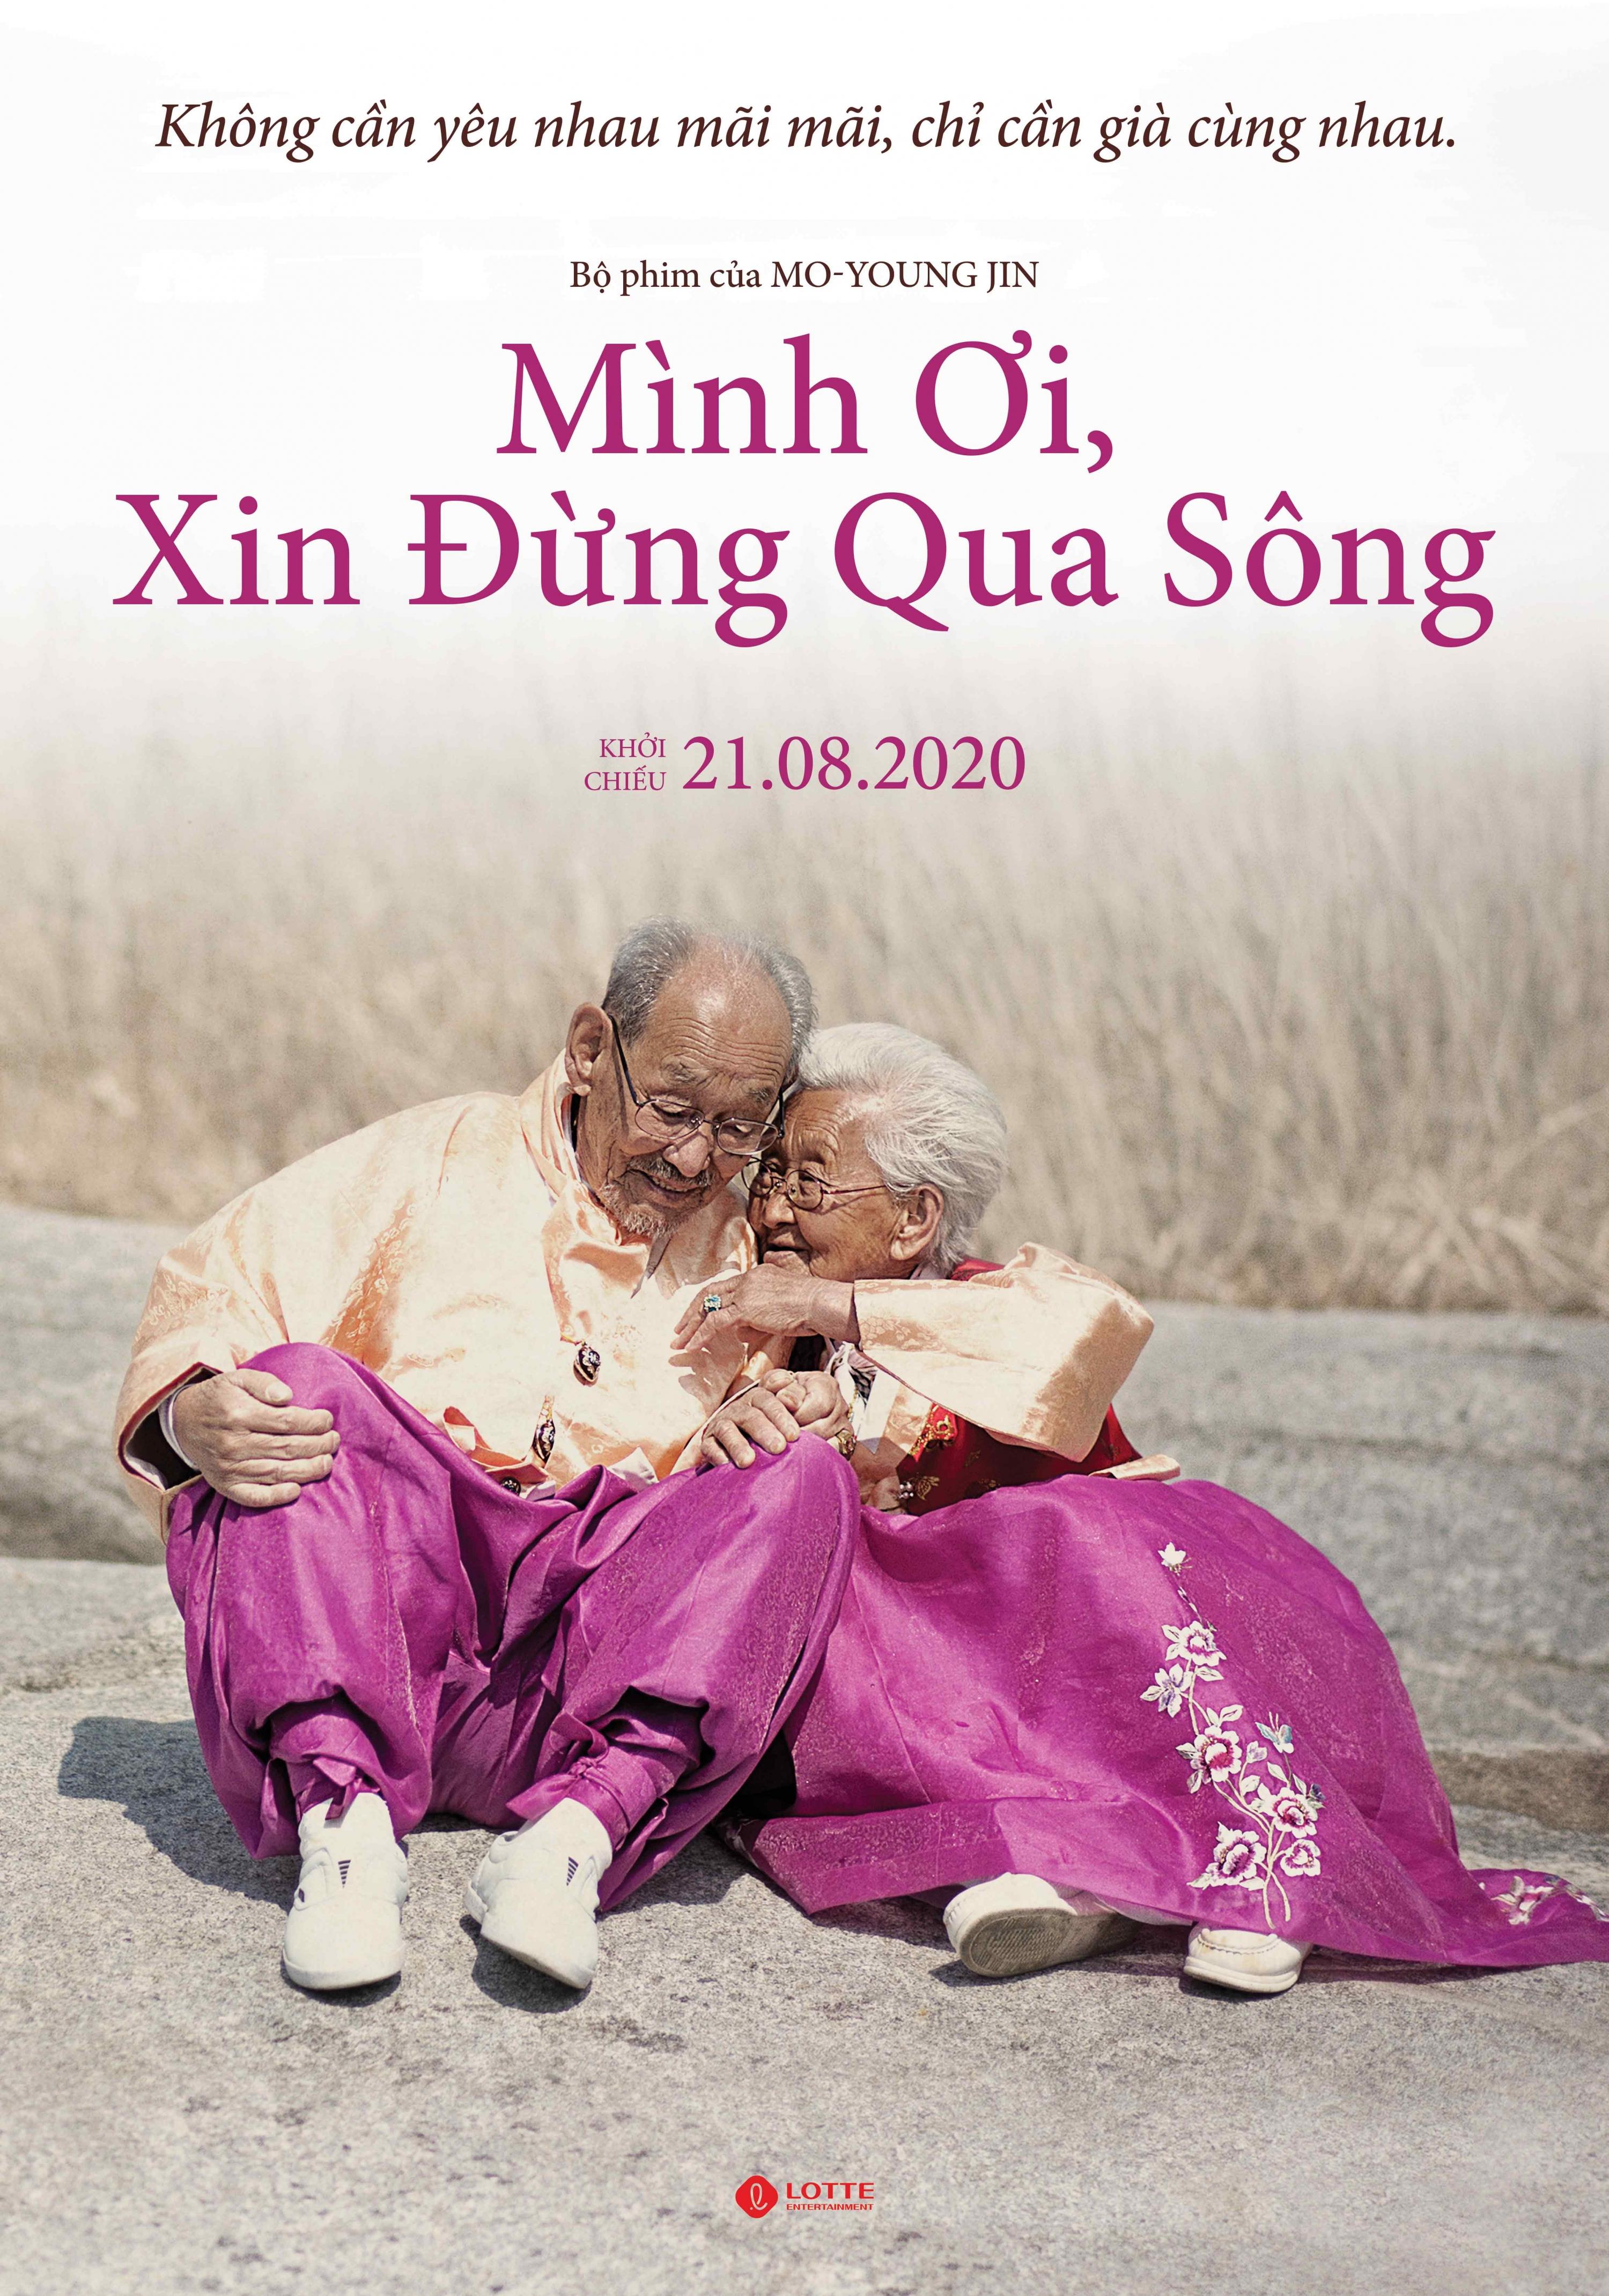 phim doc lap thanh cong nhat thoi dai cua han quoc ra mat tai viet nam